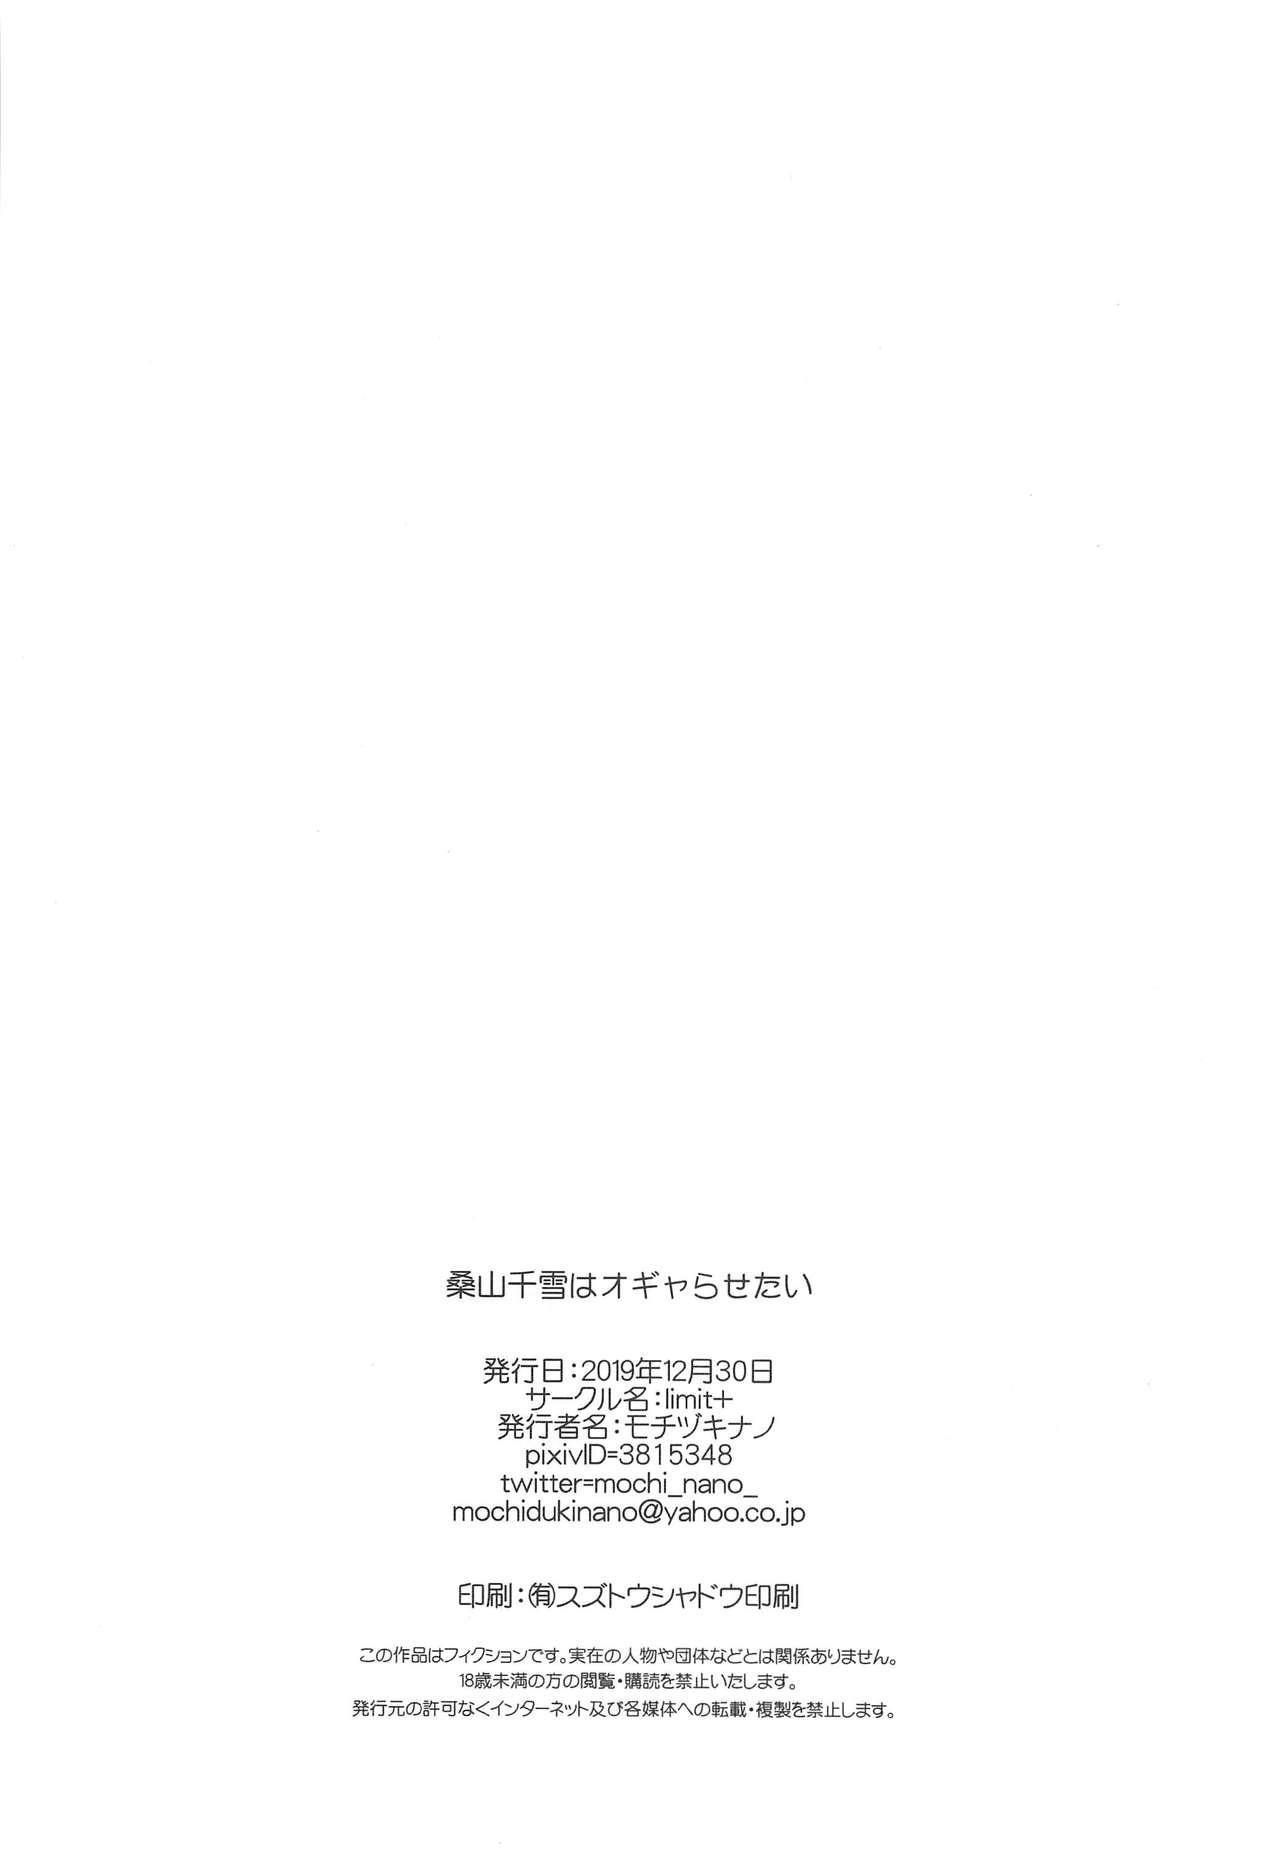 Kuwayama Chiyuki wa Ogyarasetai 25